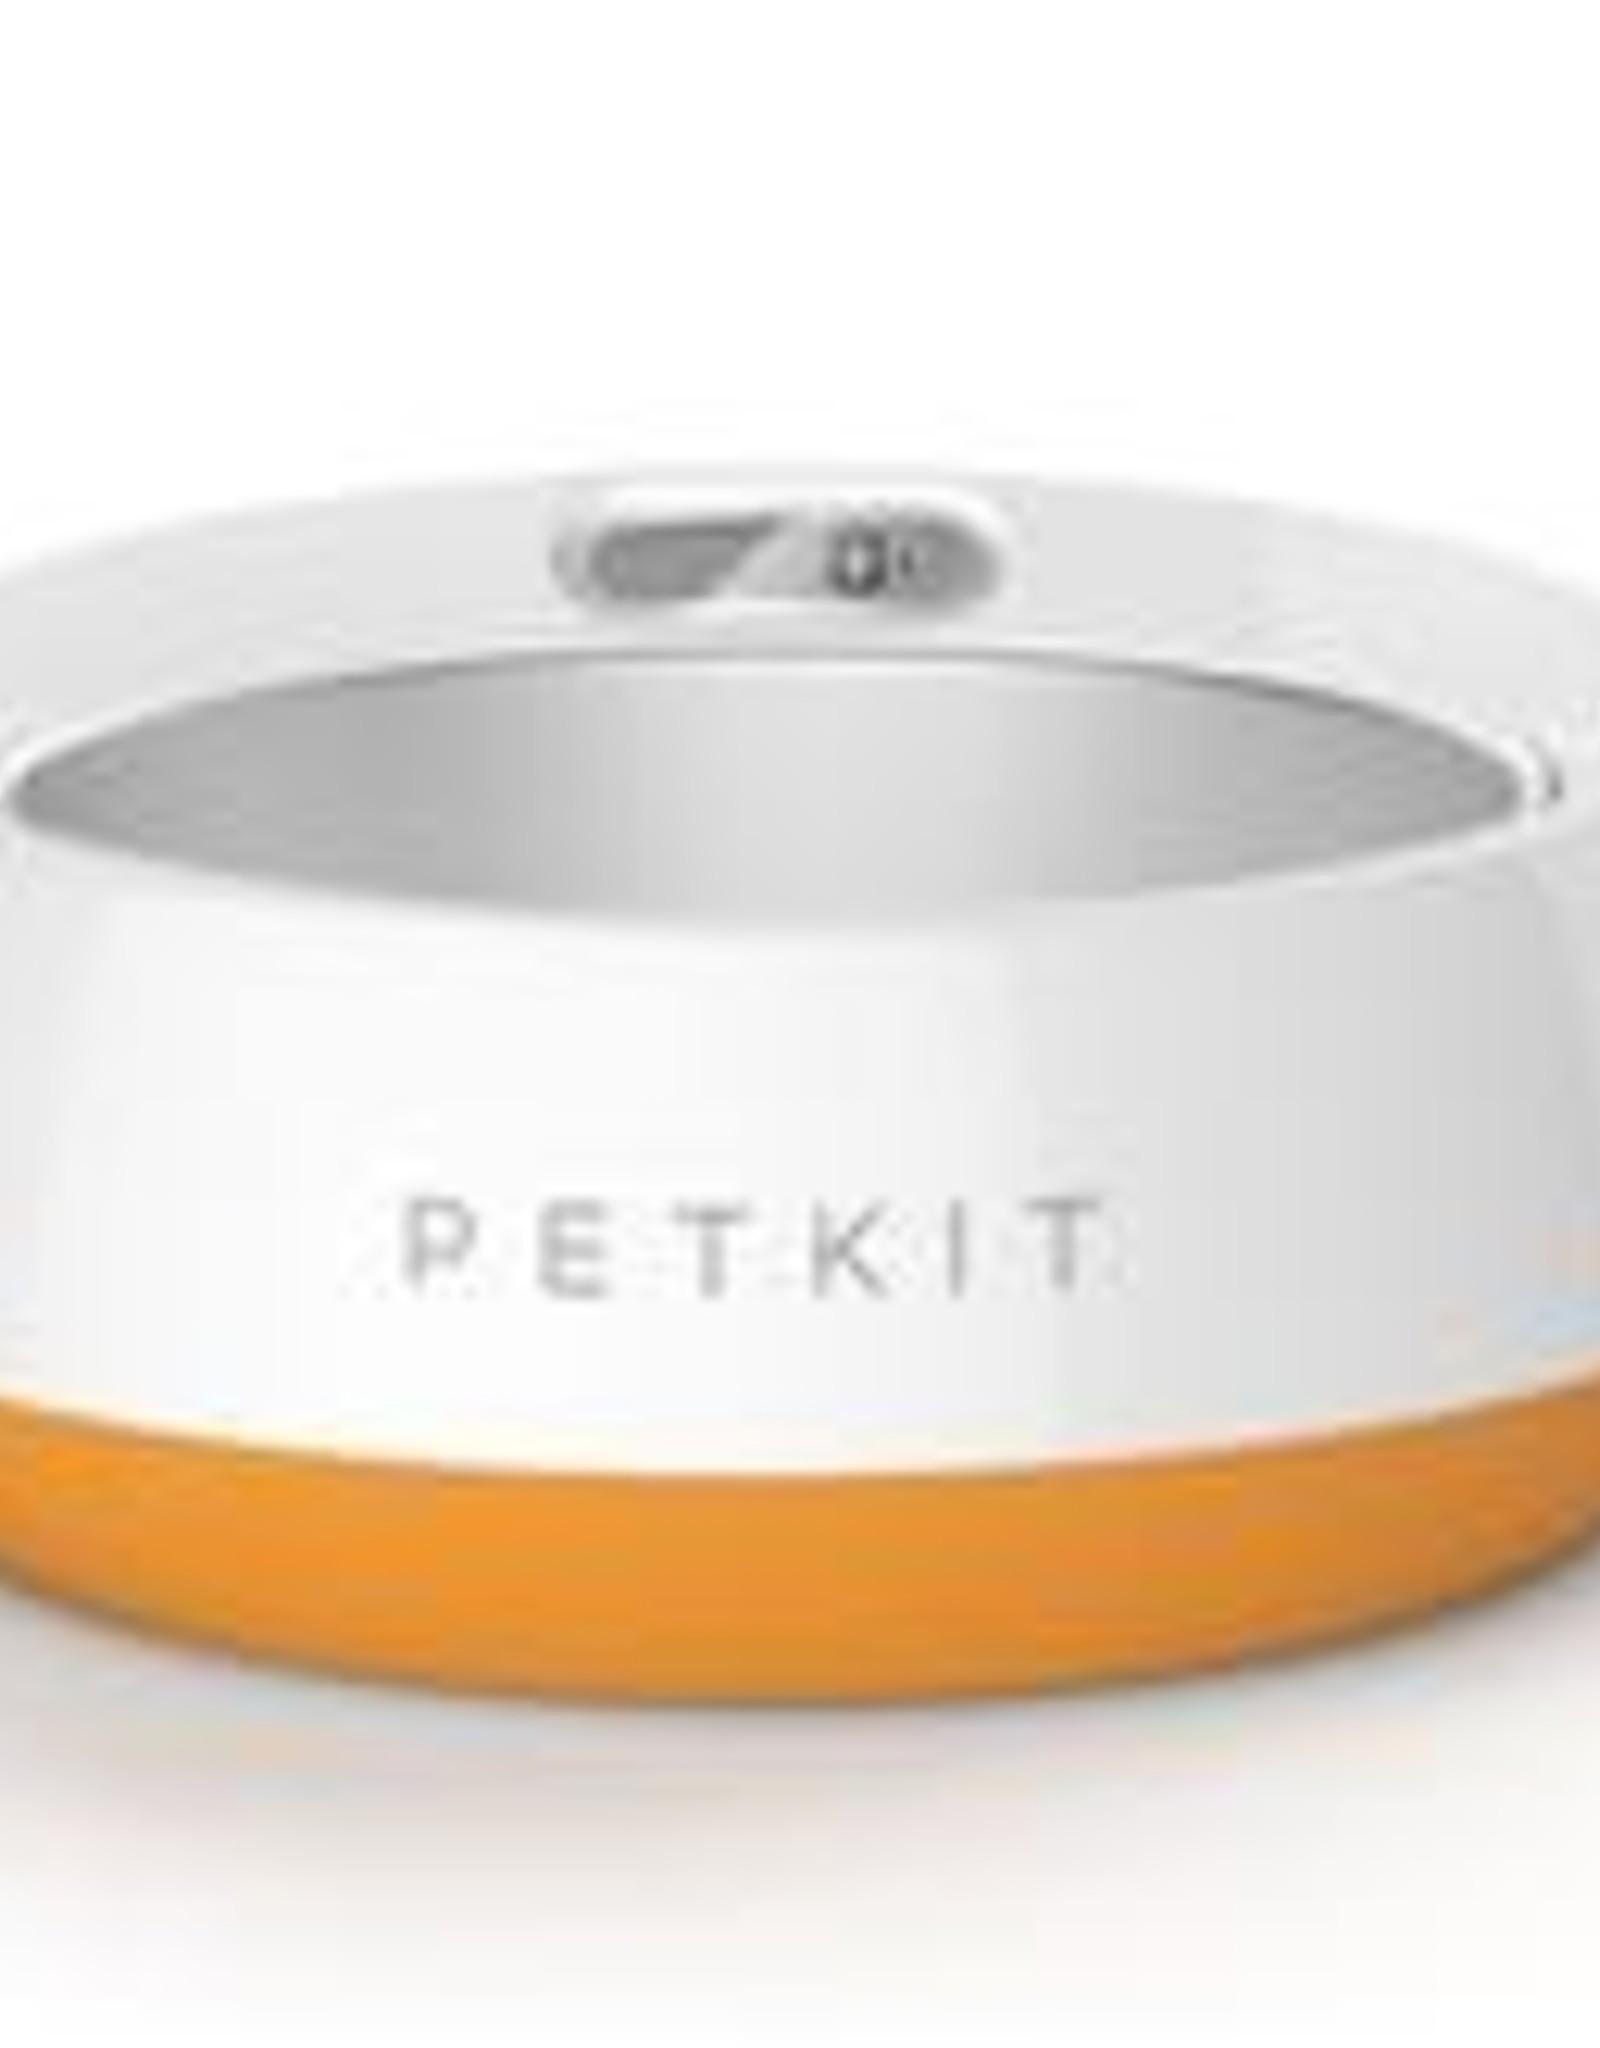 Petkit Petkit Large Machine Washable Smart Digital Feeding Pet Bowl